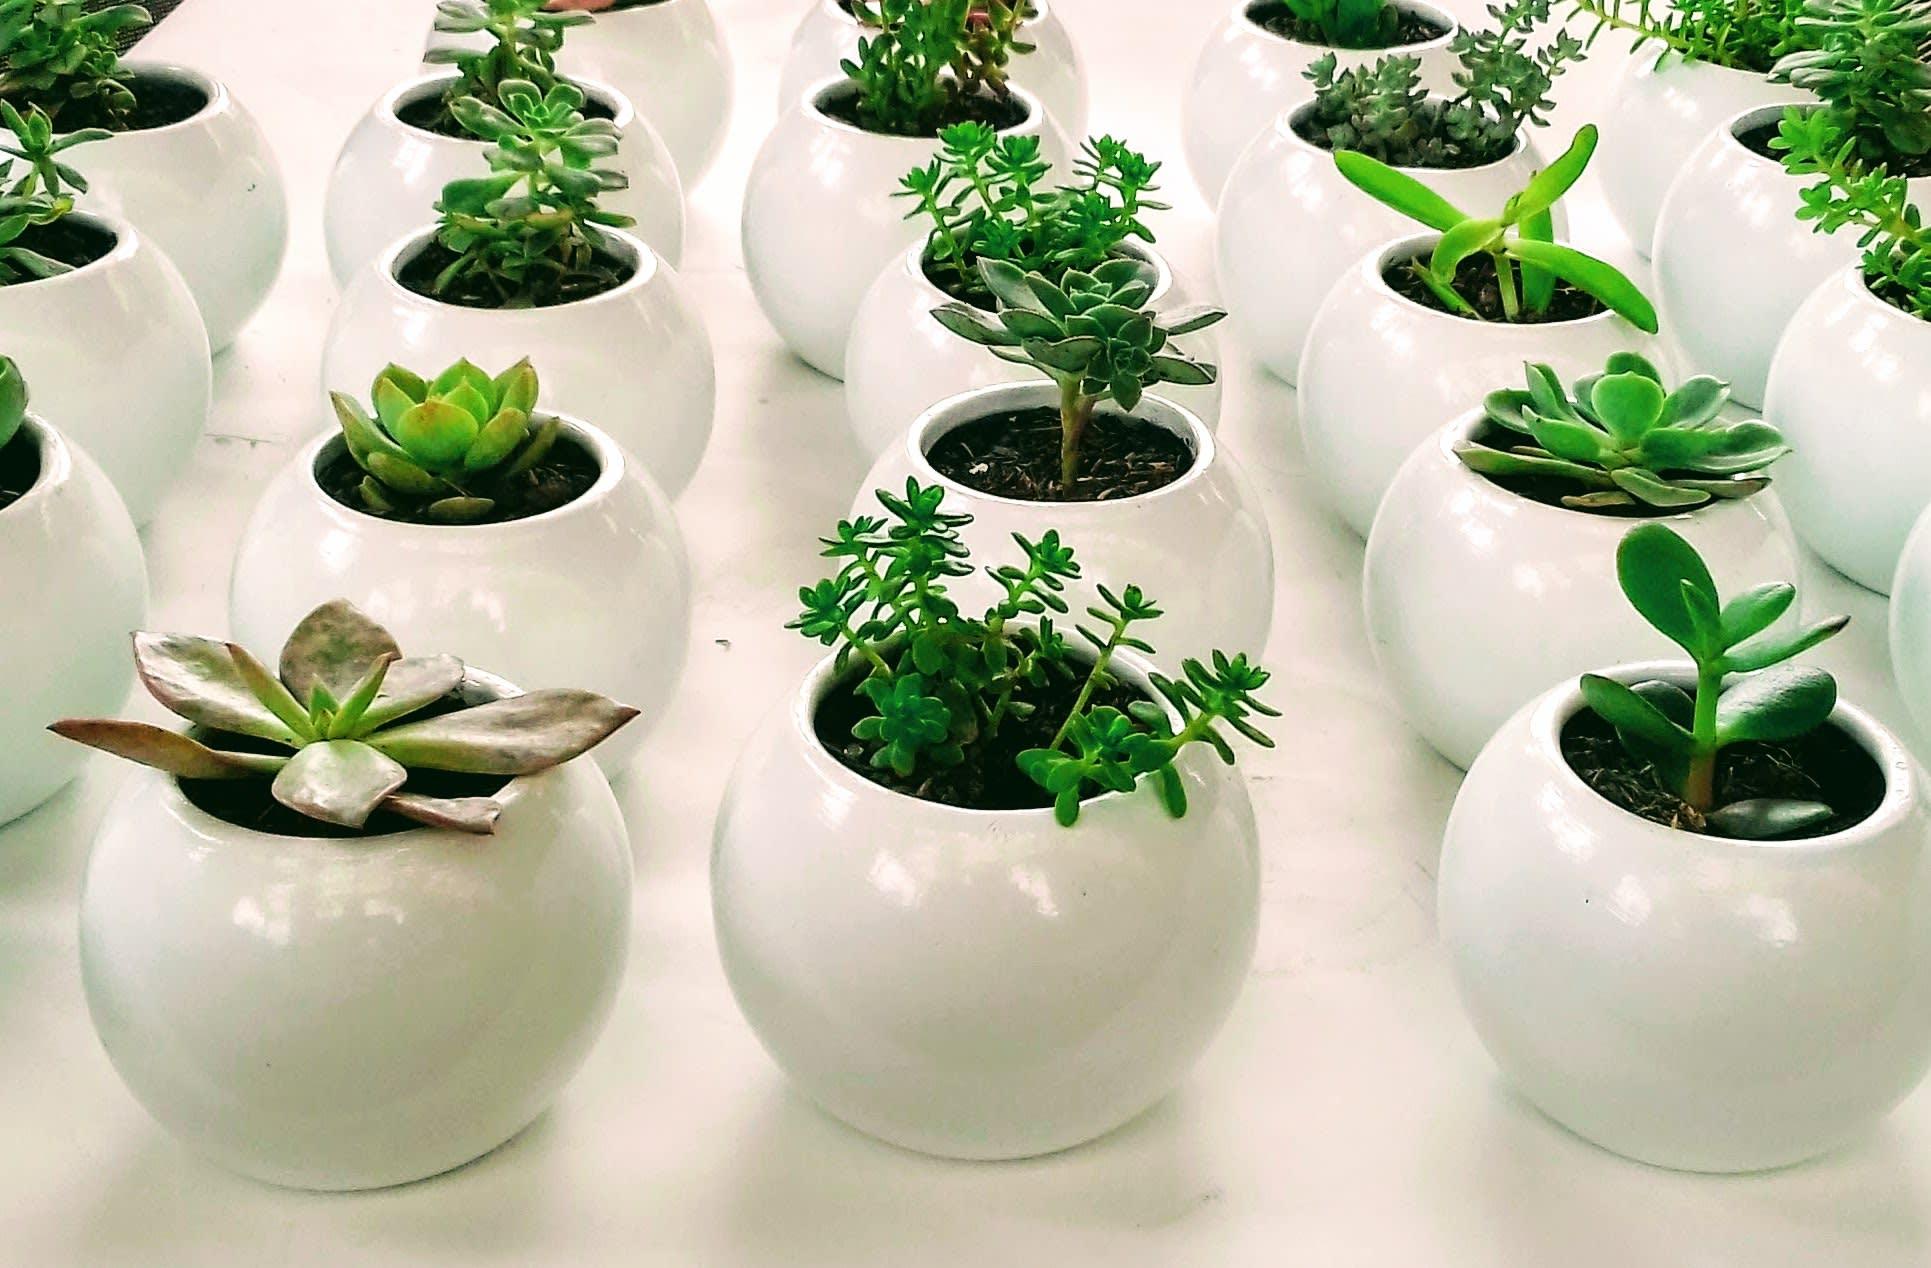 Suculentas materas cerámica resinadas recordatorios Bogotá. Recordatorios Neea Flora